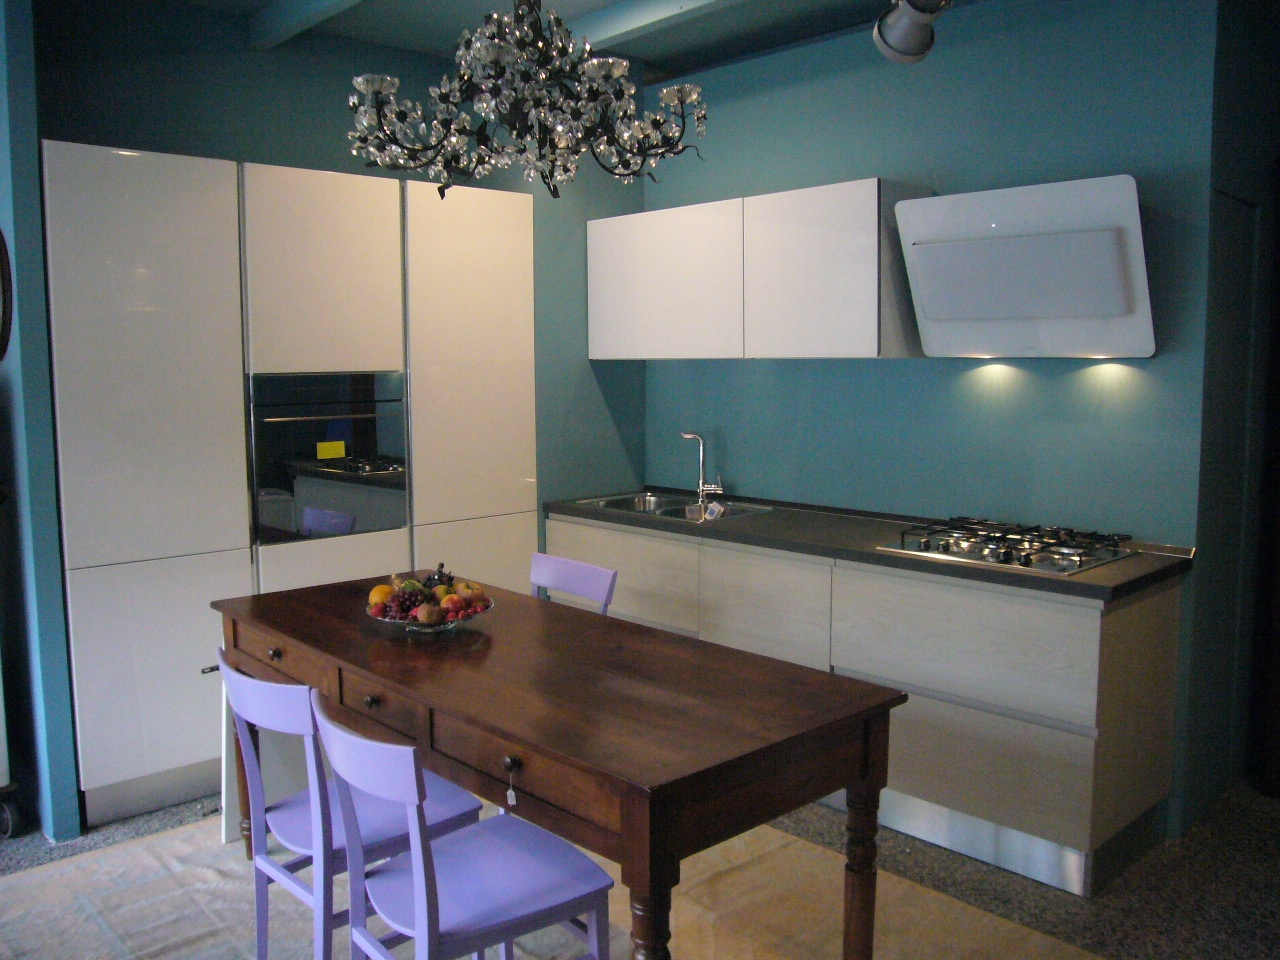 Cucine In Offerta Roma: Plana Kalì Arredo3 Scontata Del 50% Cucine  #886943 1280 960 Veneta Cucine O Arredo3